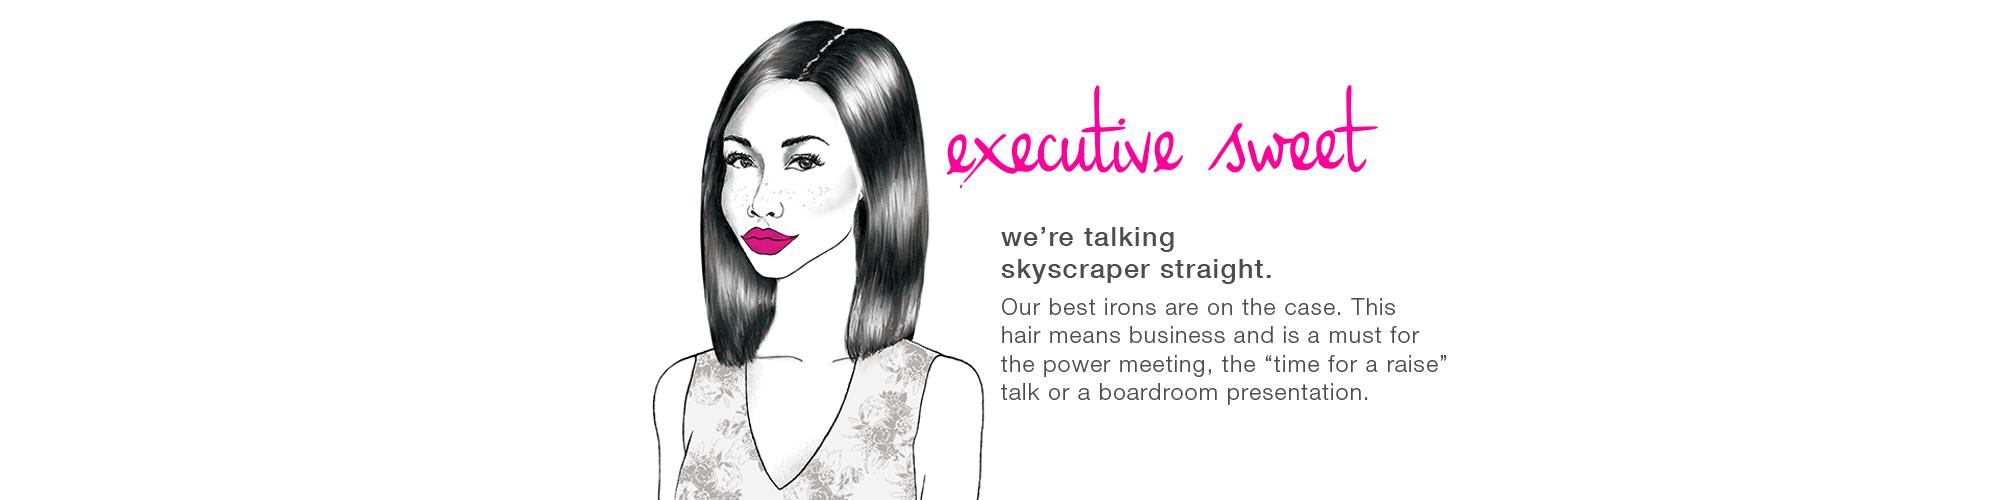 sleek hair style - blo services